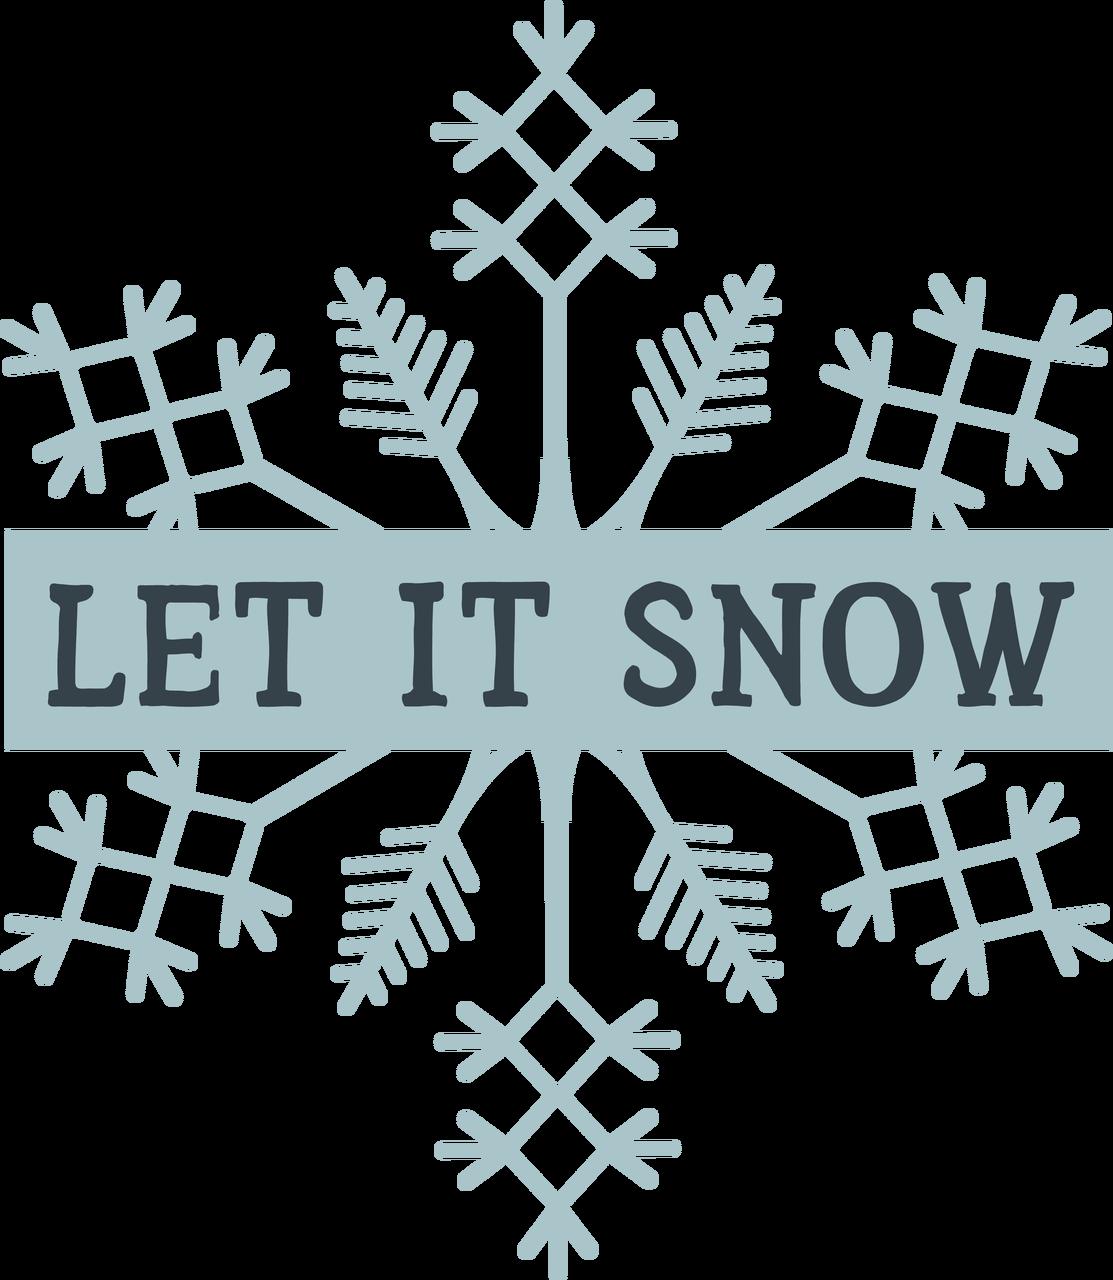 Let It Snow on Snowflake SVG Cut File